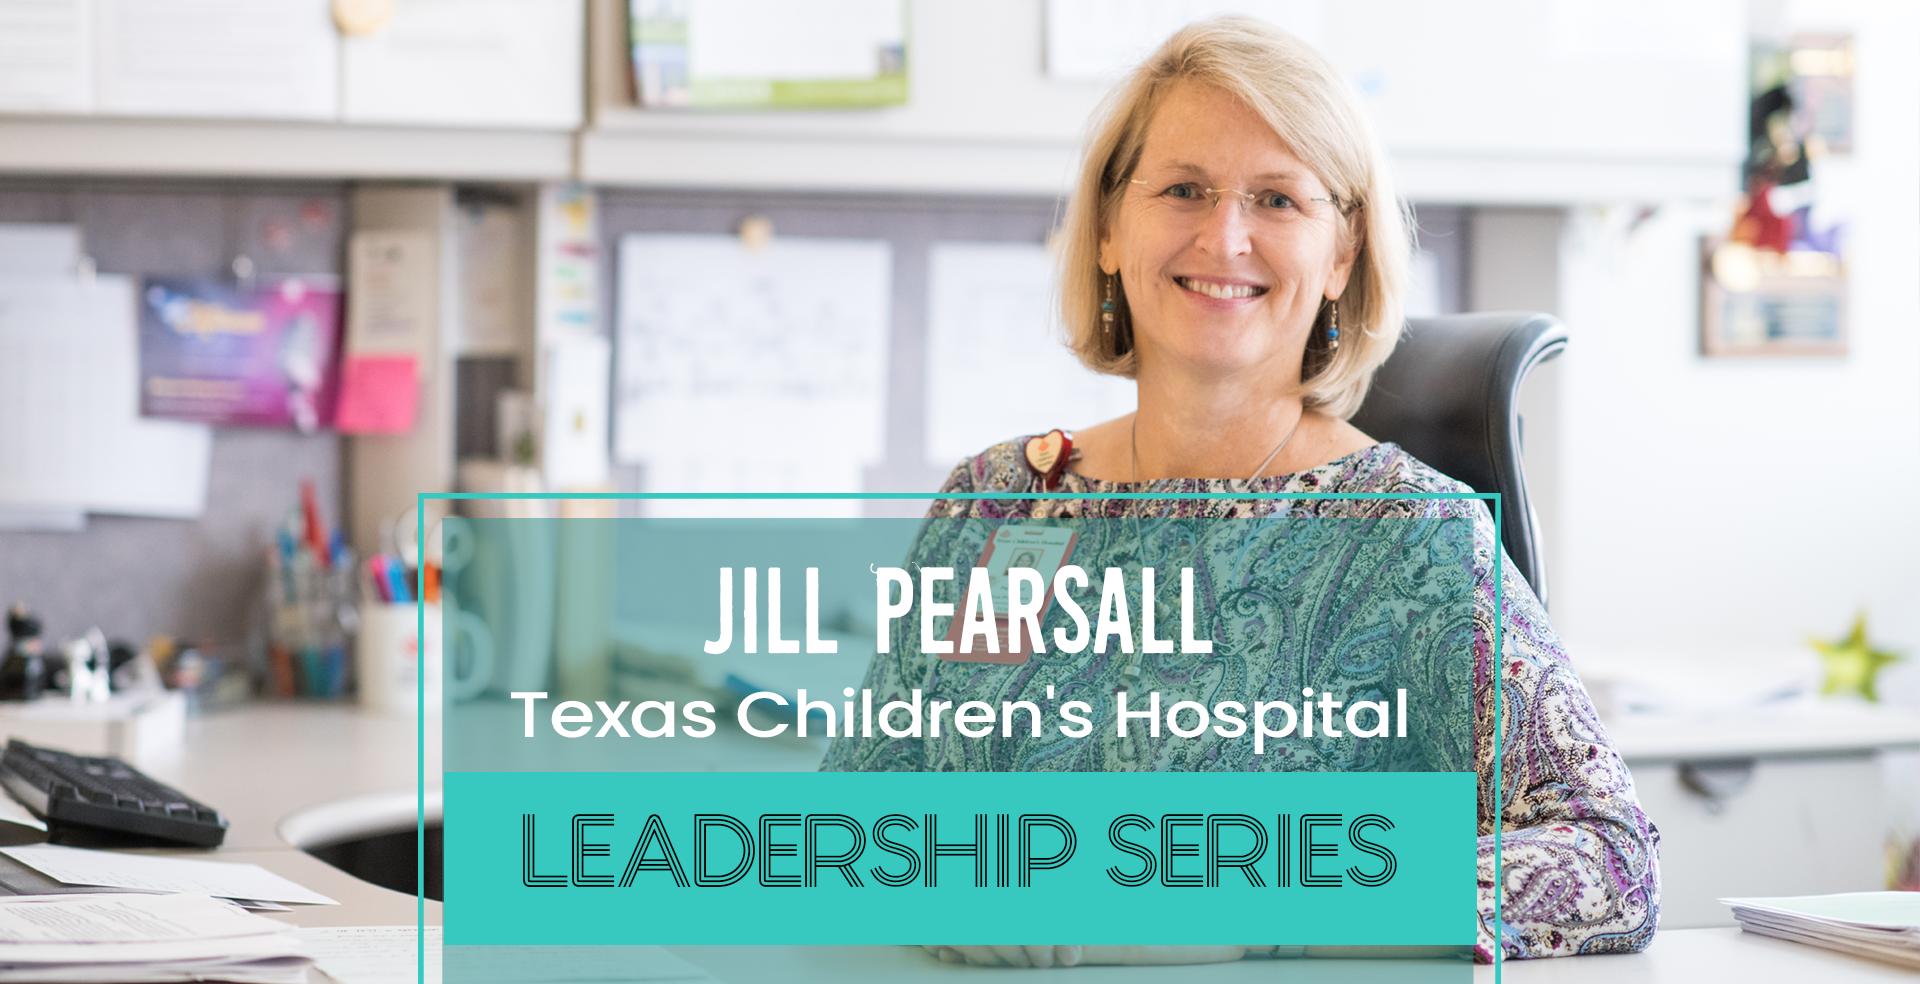 Jill-Pearsall-HealthSpaces-hero-2